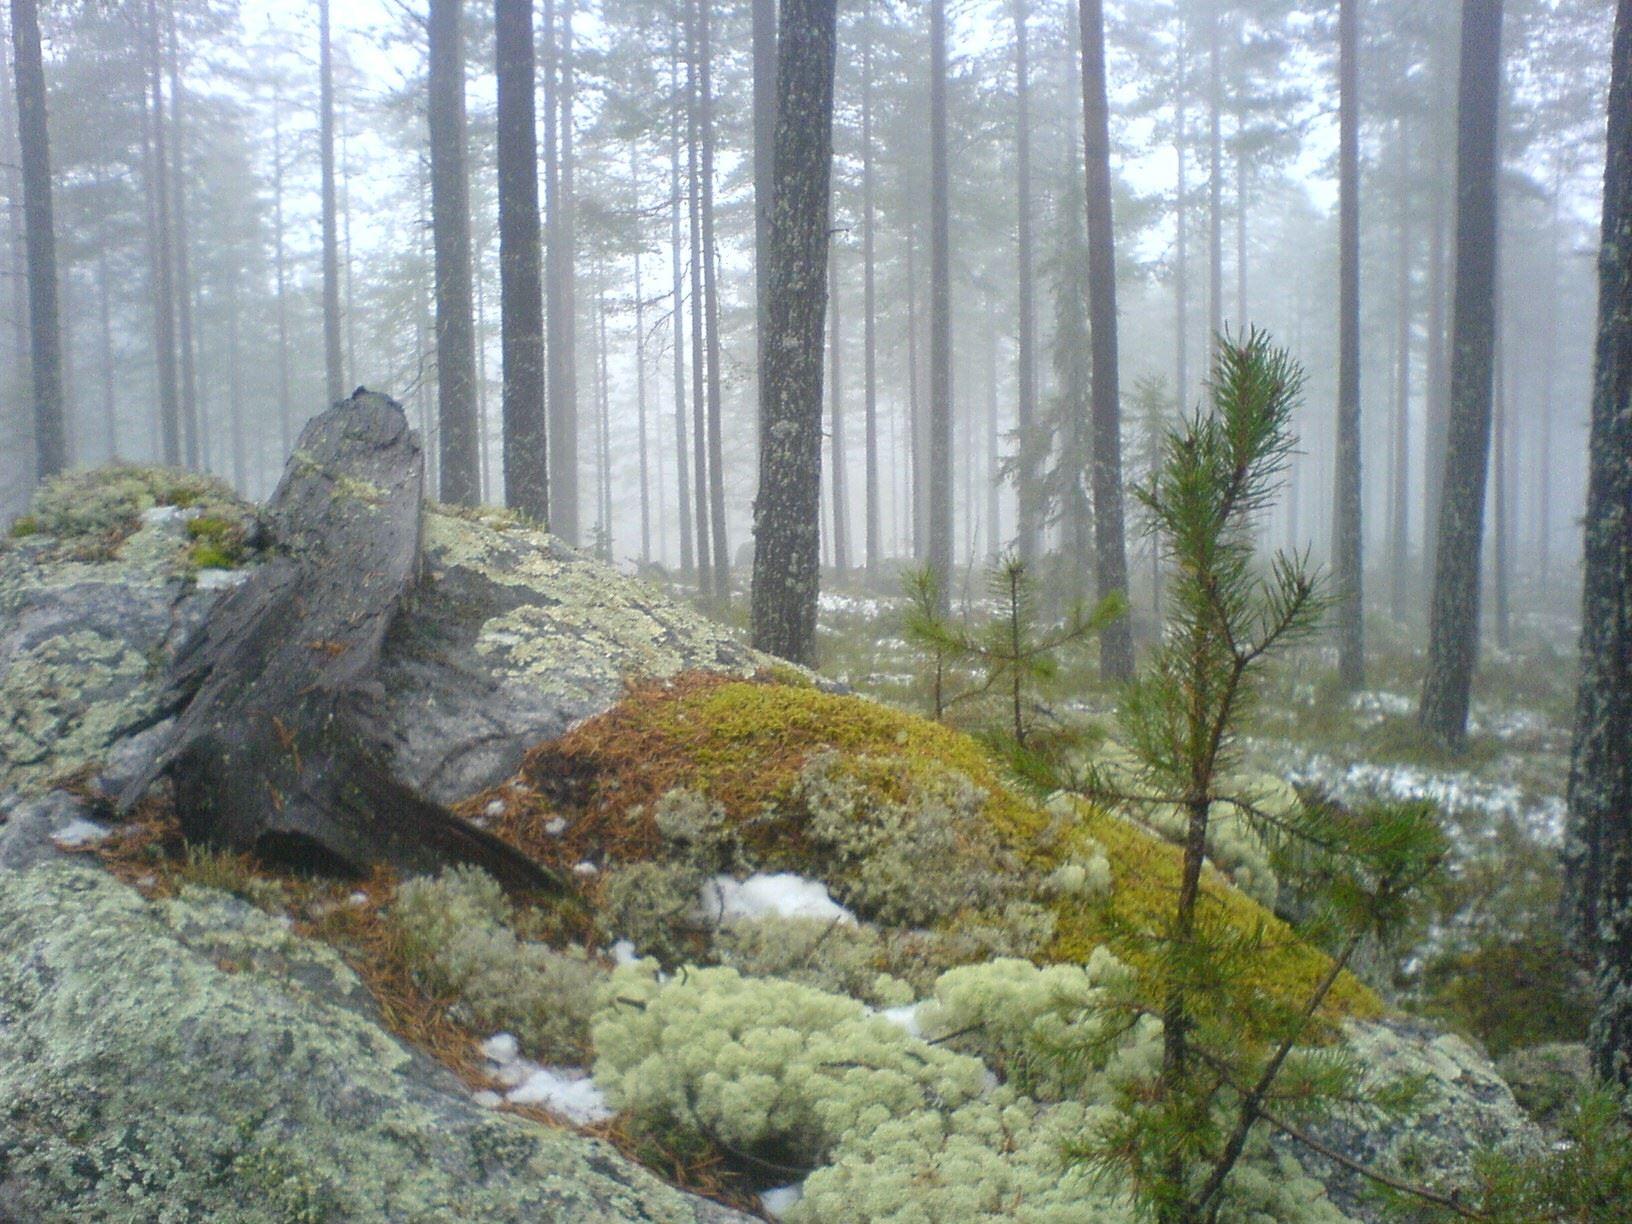 Björnexkursion i vildmarken - guidade turer, Orsa Finnmark